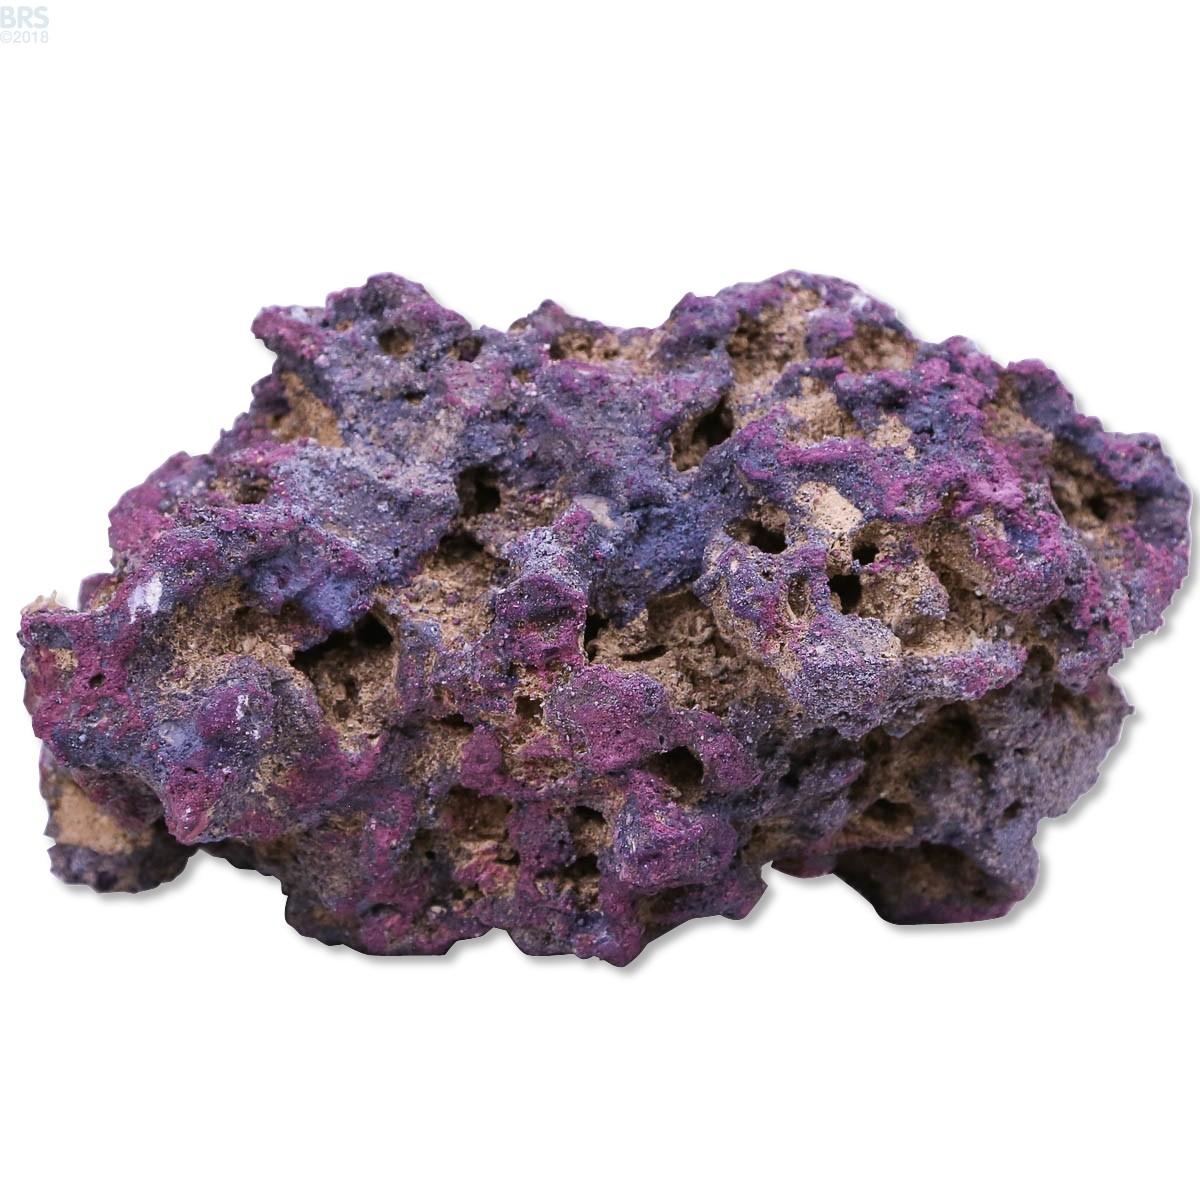 Liferock Dry Live Rock Caribsea Bulk Reef Supply